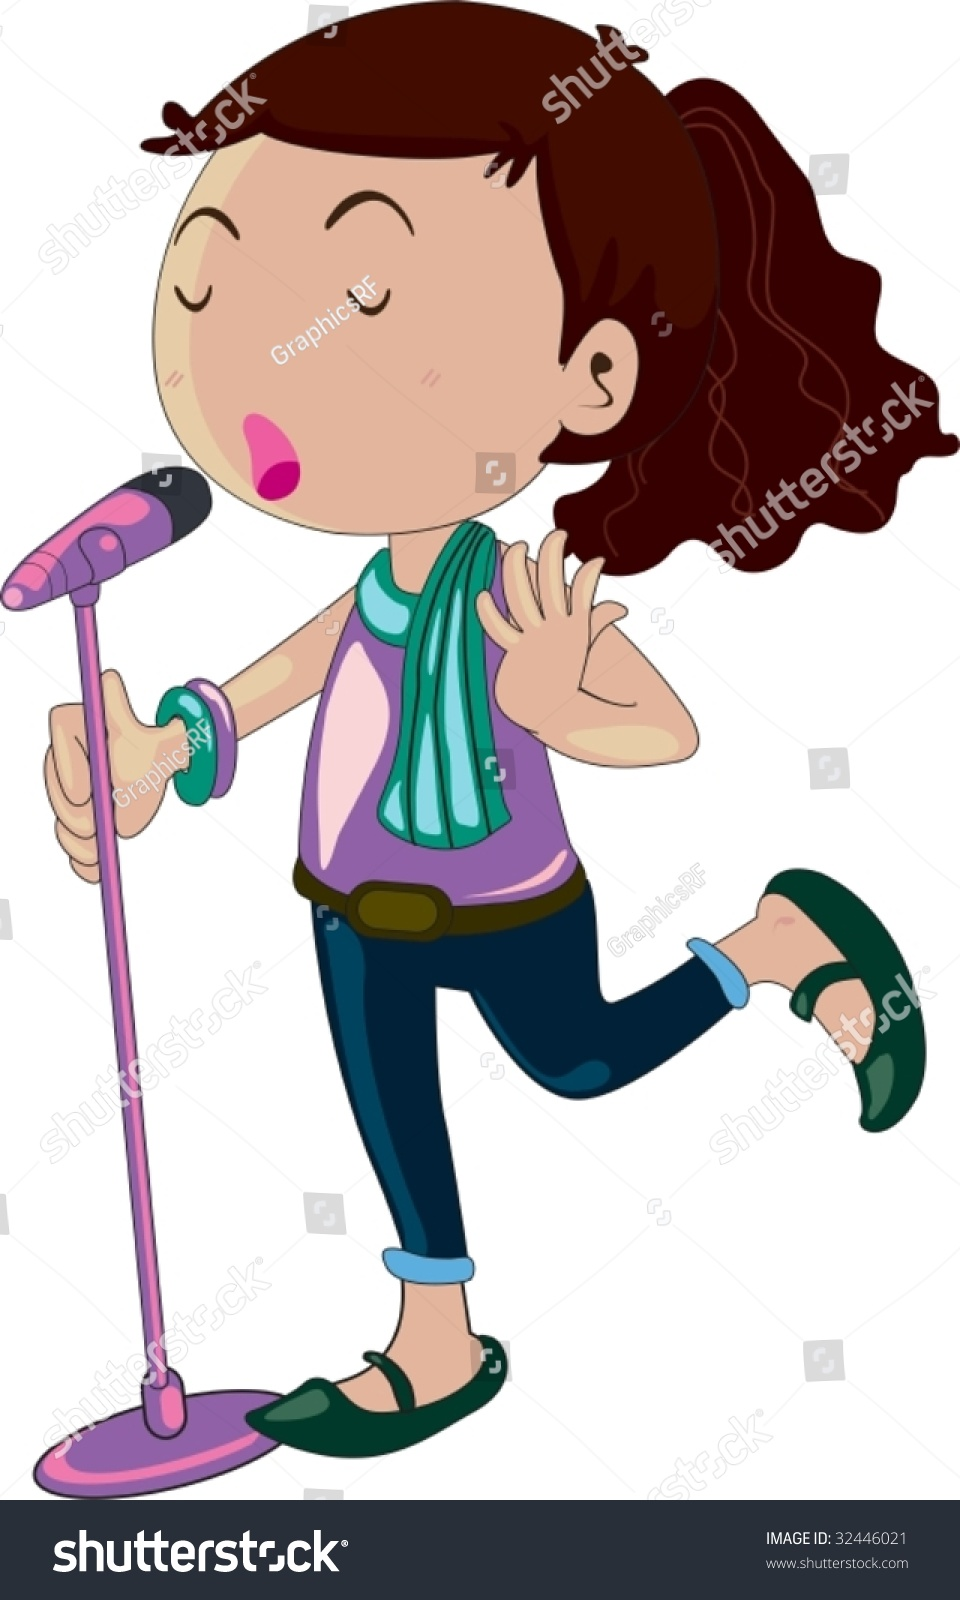 child singer clipart - photo #12